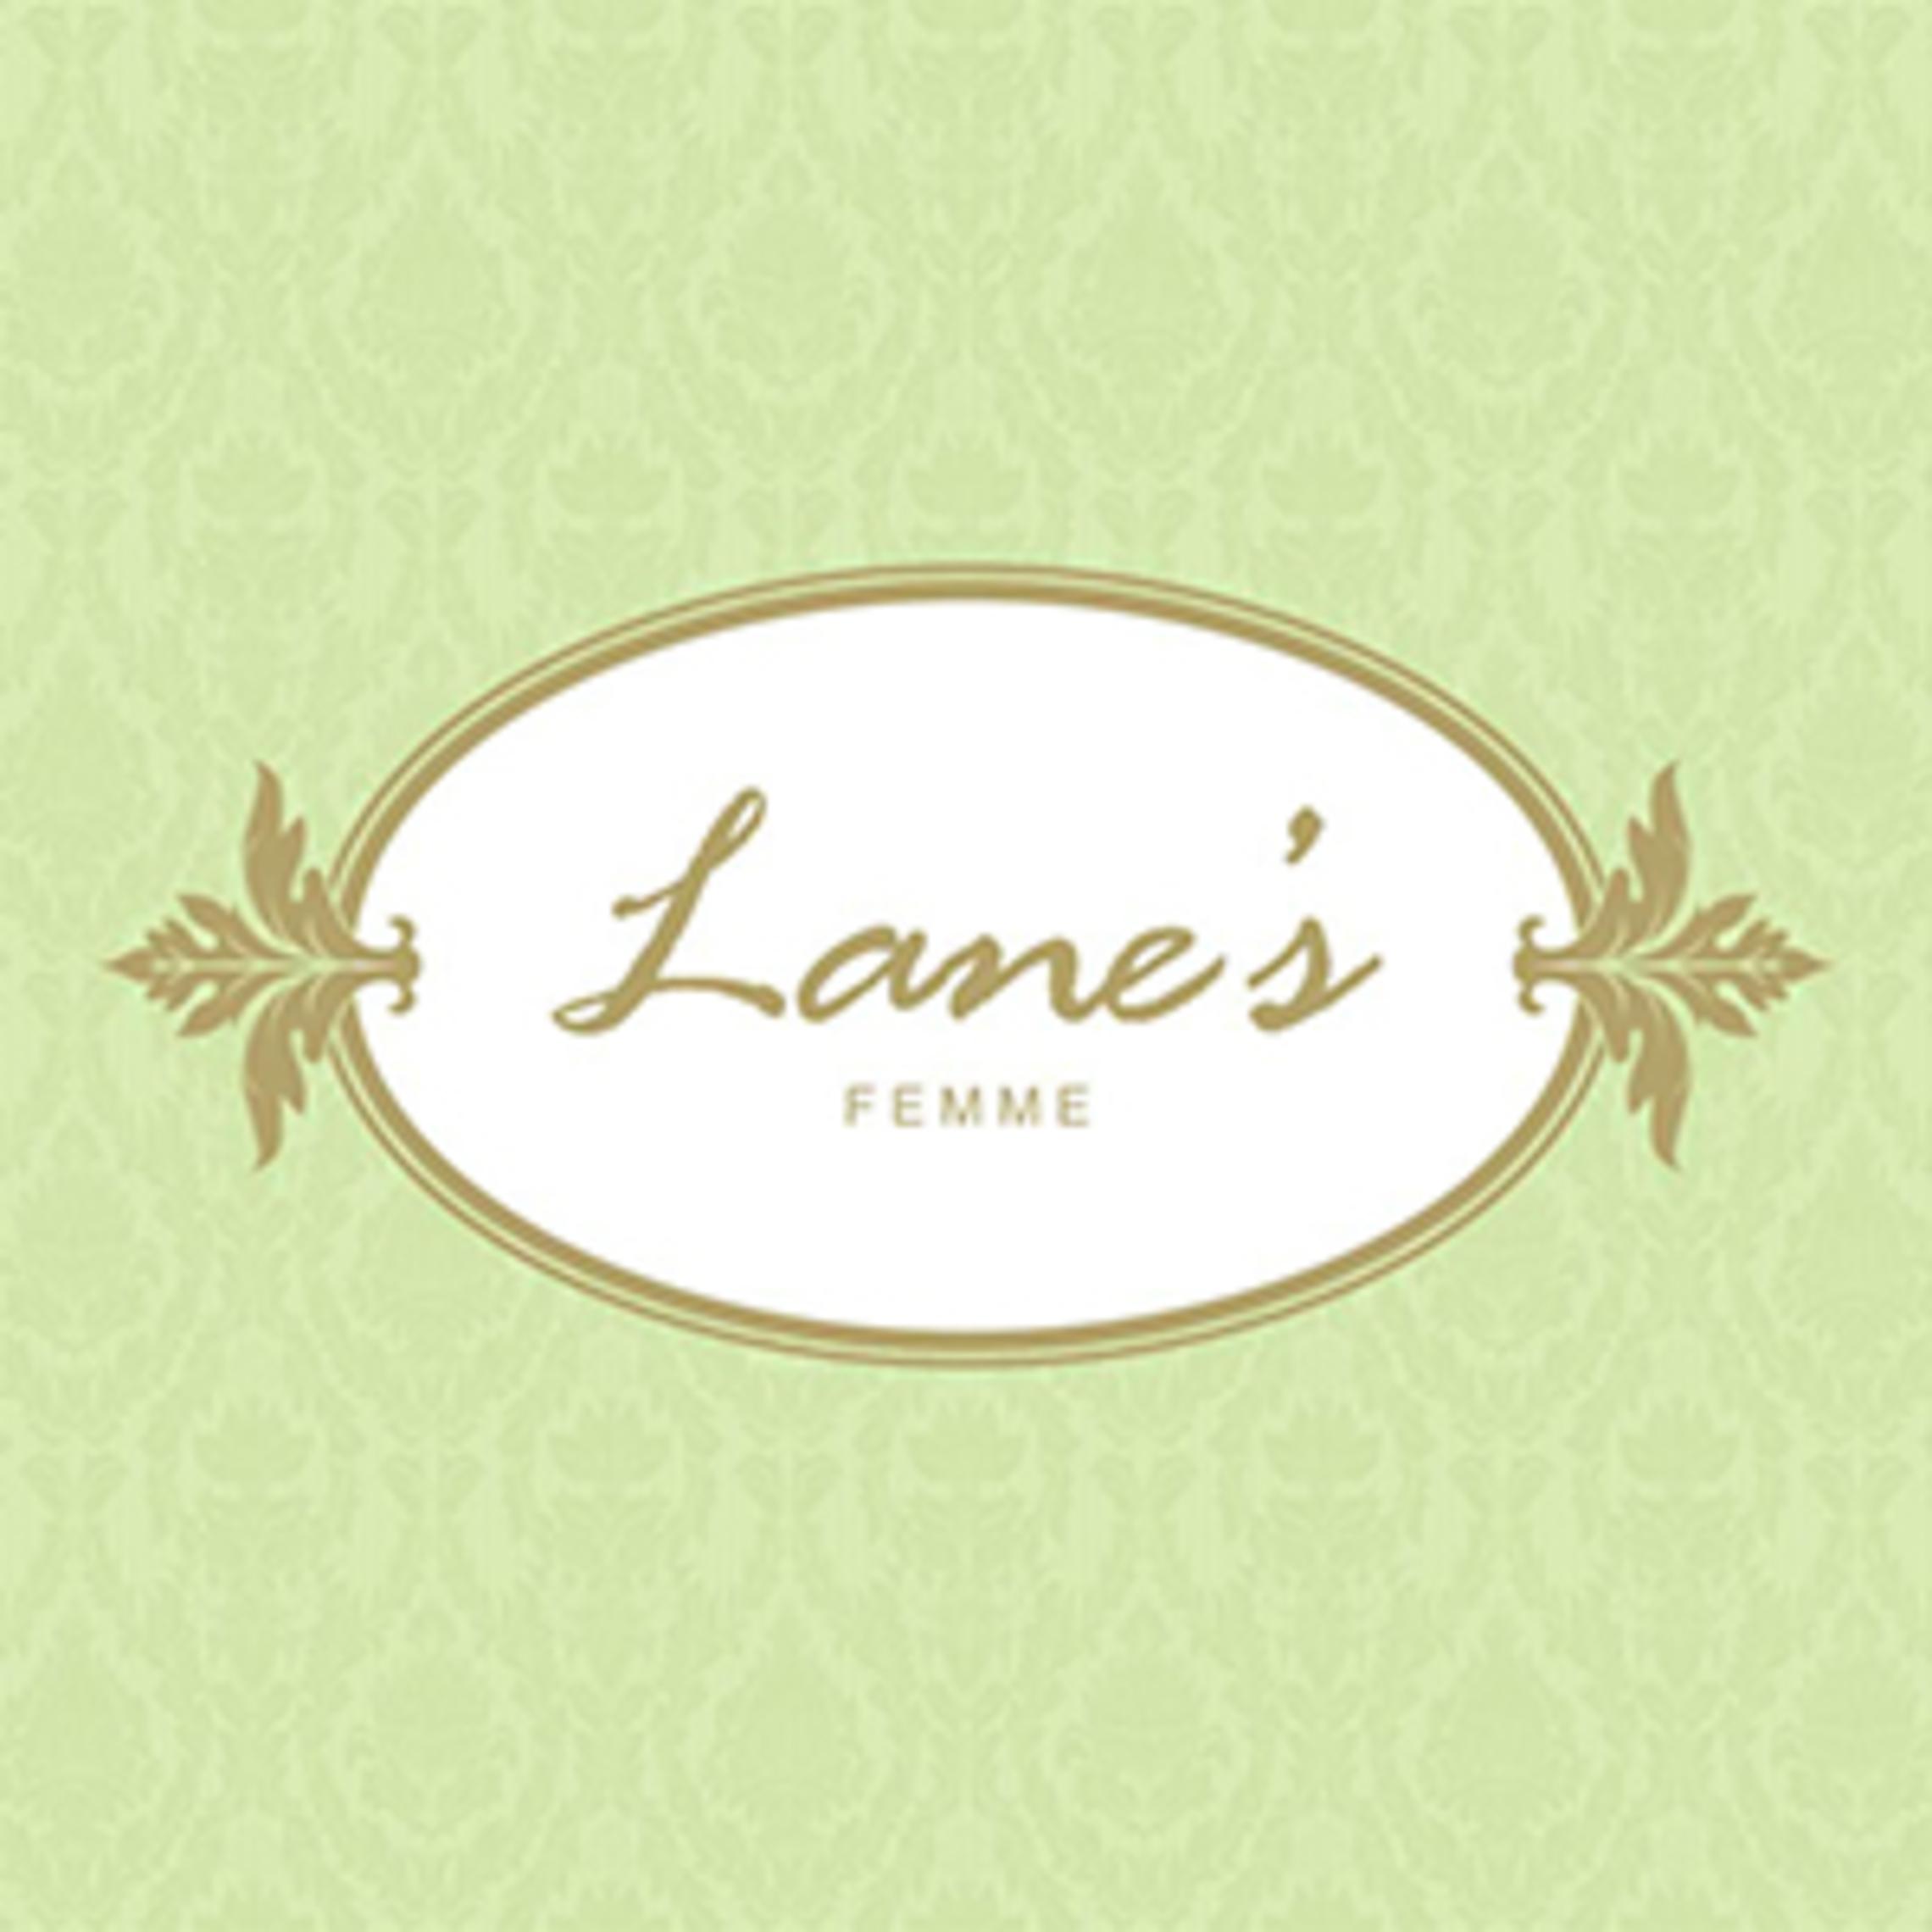 lanes accessories store- company logo